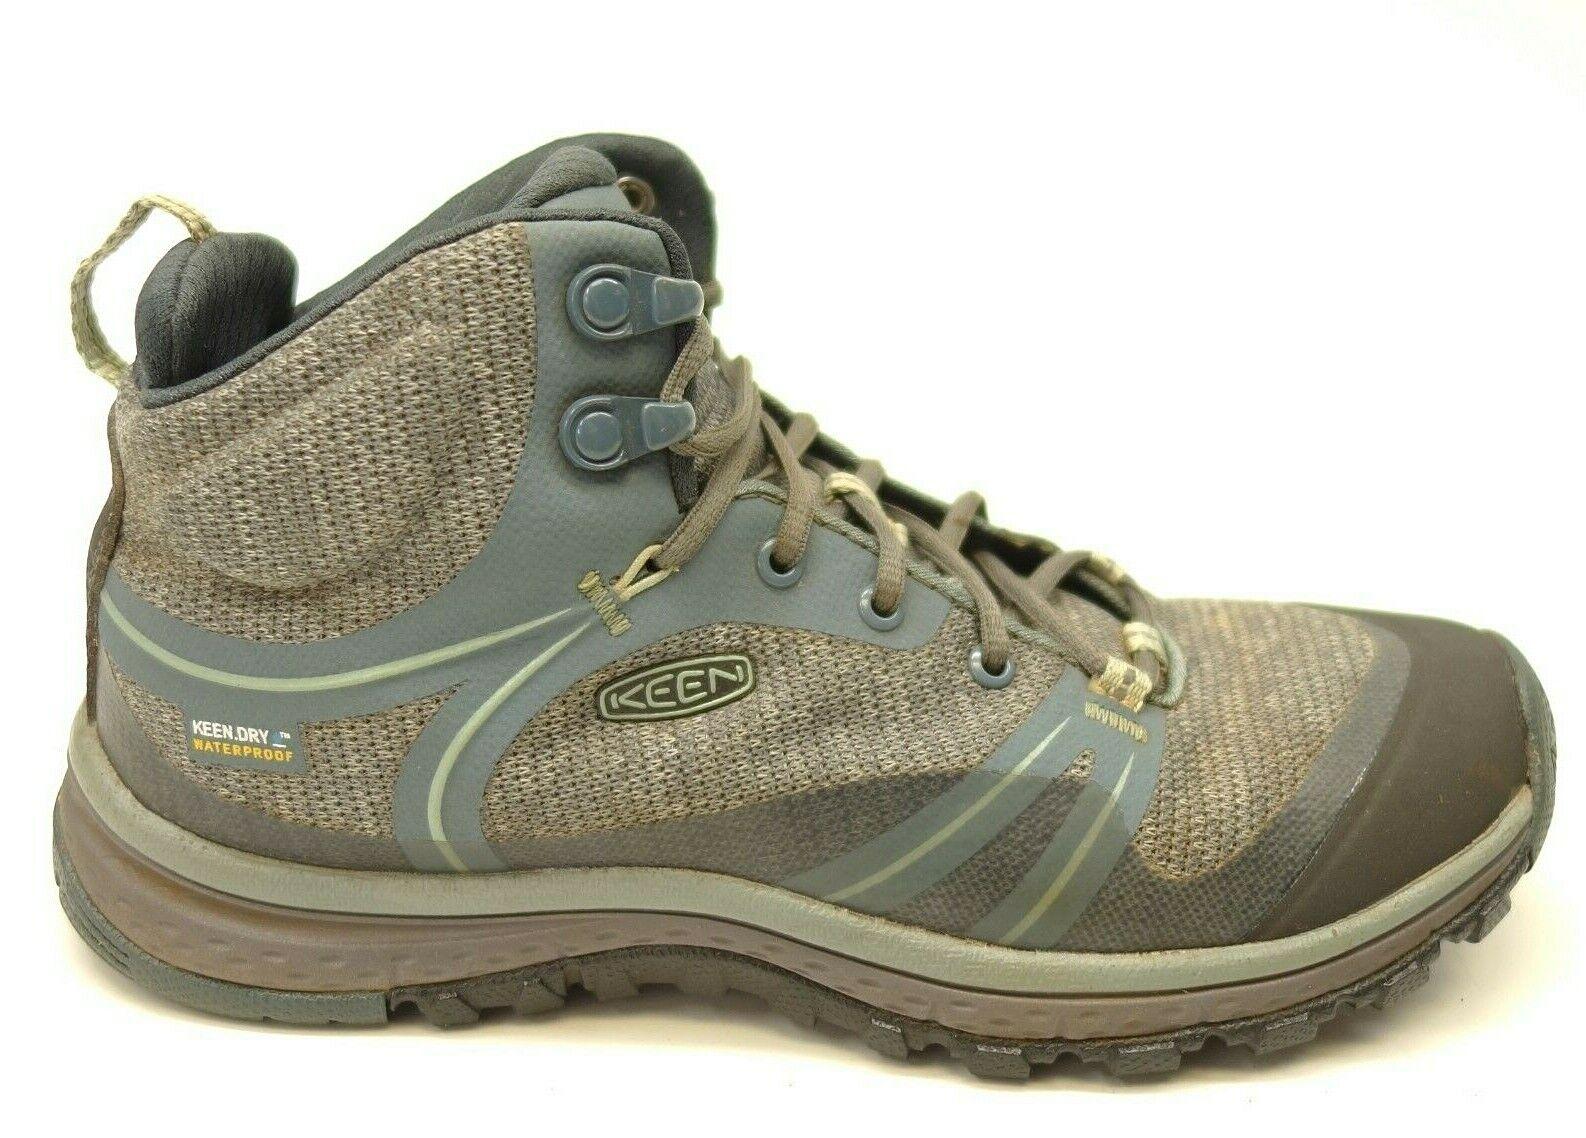 Keen Terradora US 6 Eu 36 Grau Mittelhoch Wp Athletic Trail Wandern Damen Schuhe